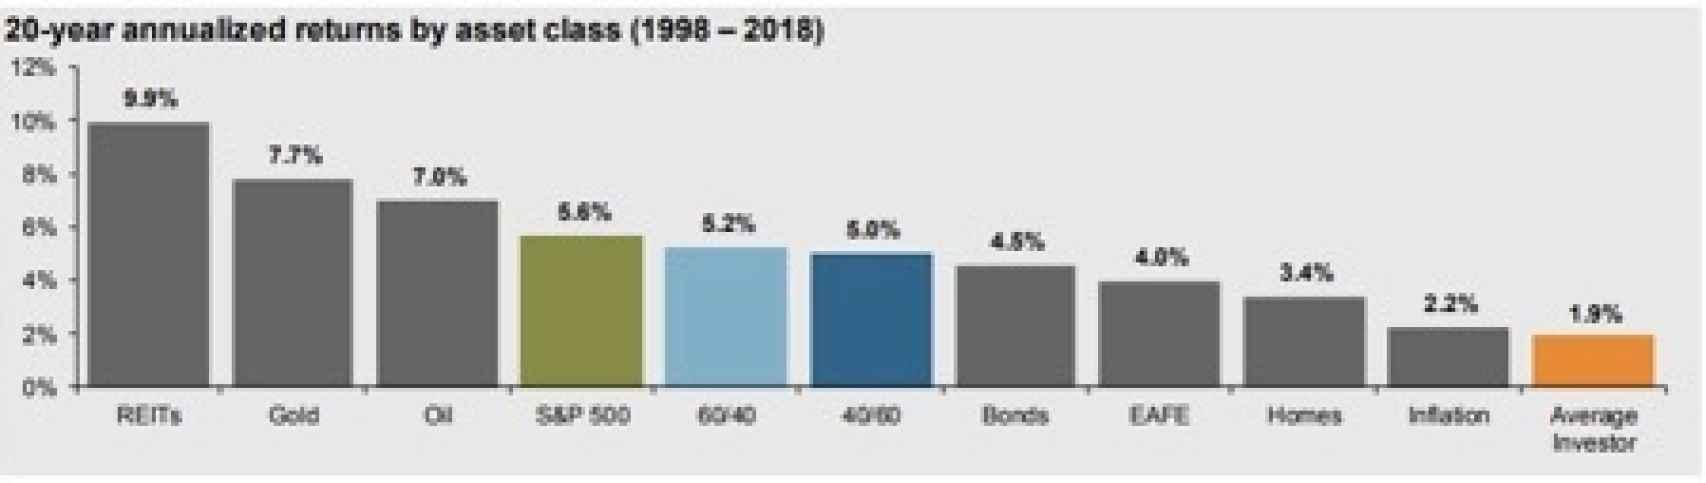 Fuente- JP Morgan Guide to the Markets, citing Dalbar Inc